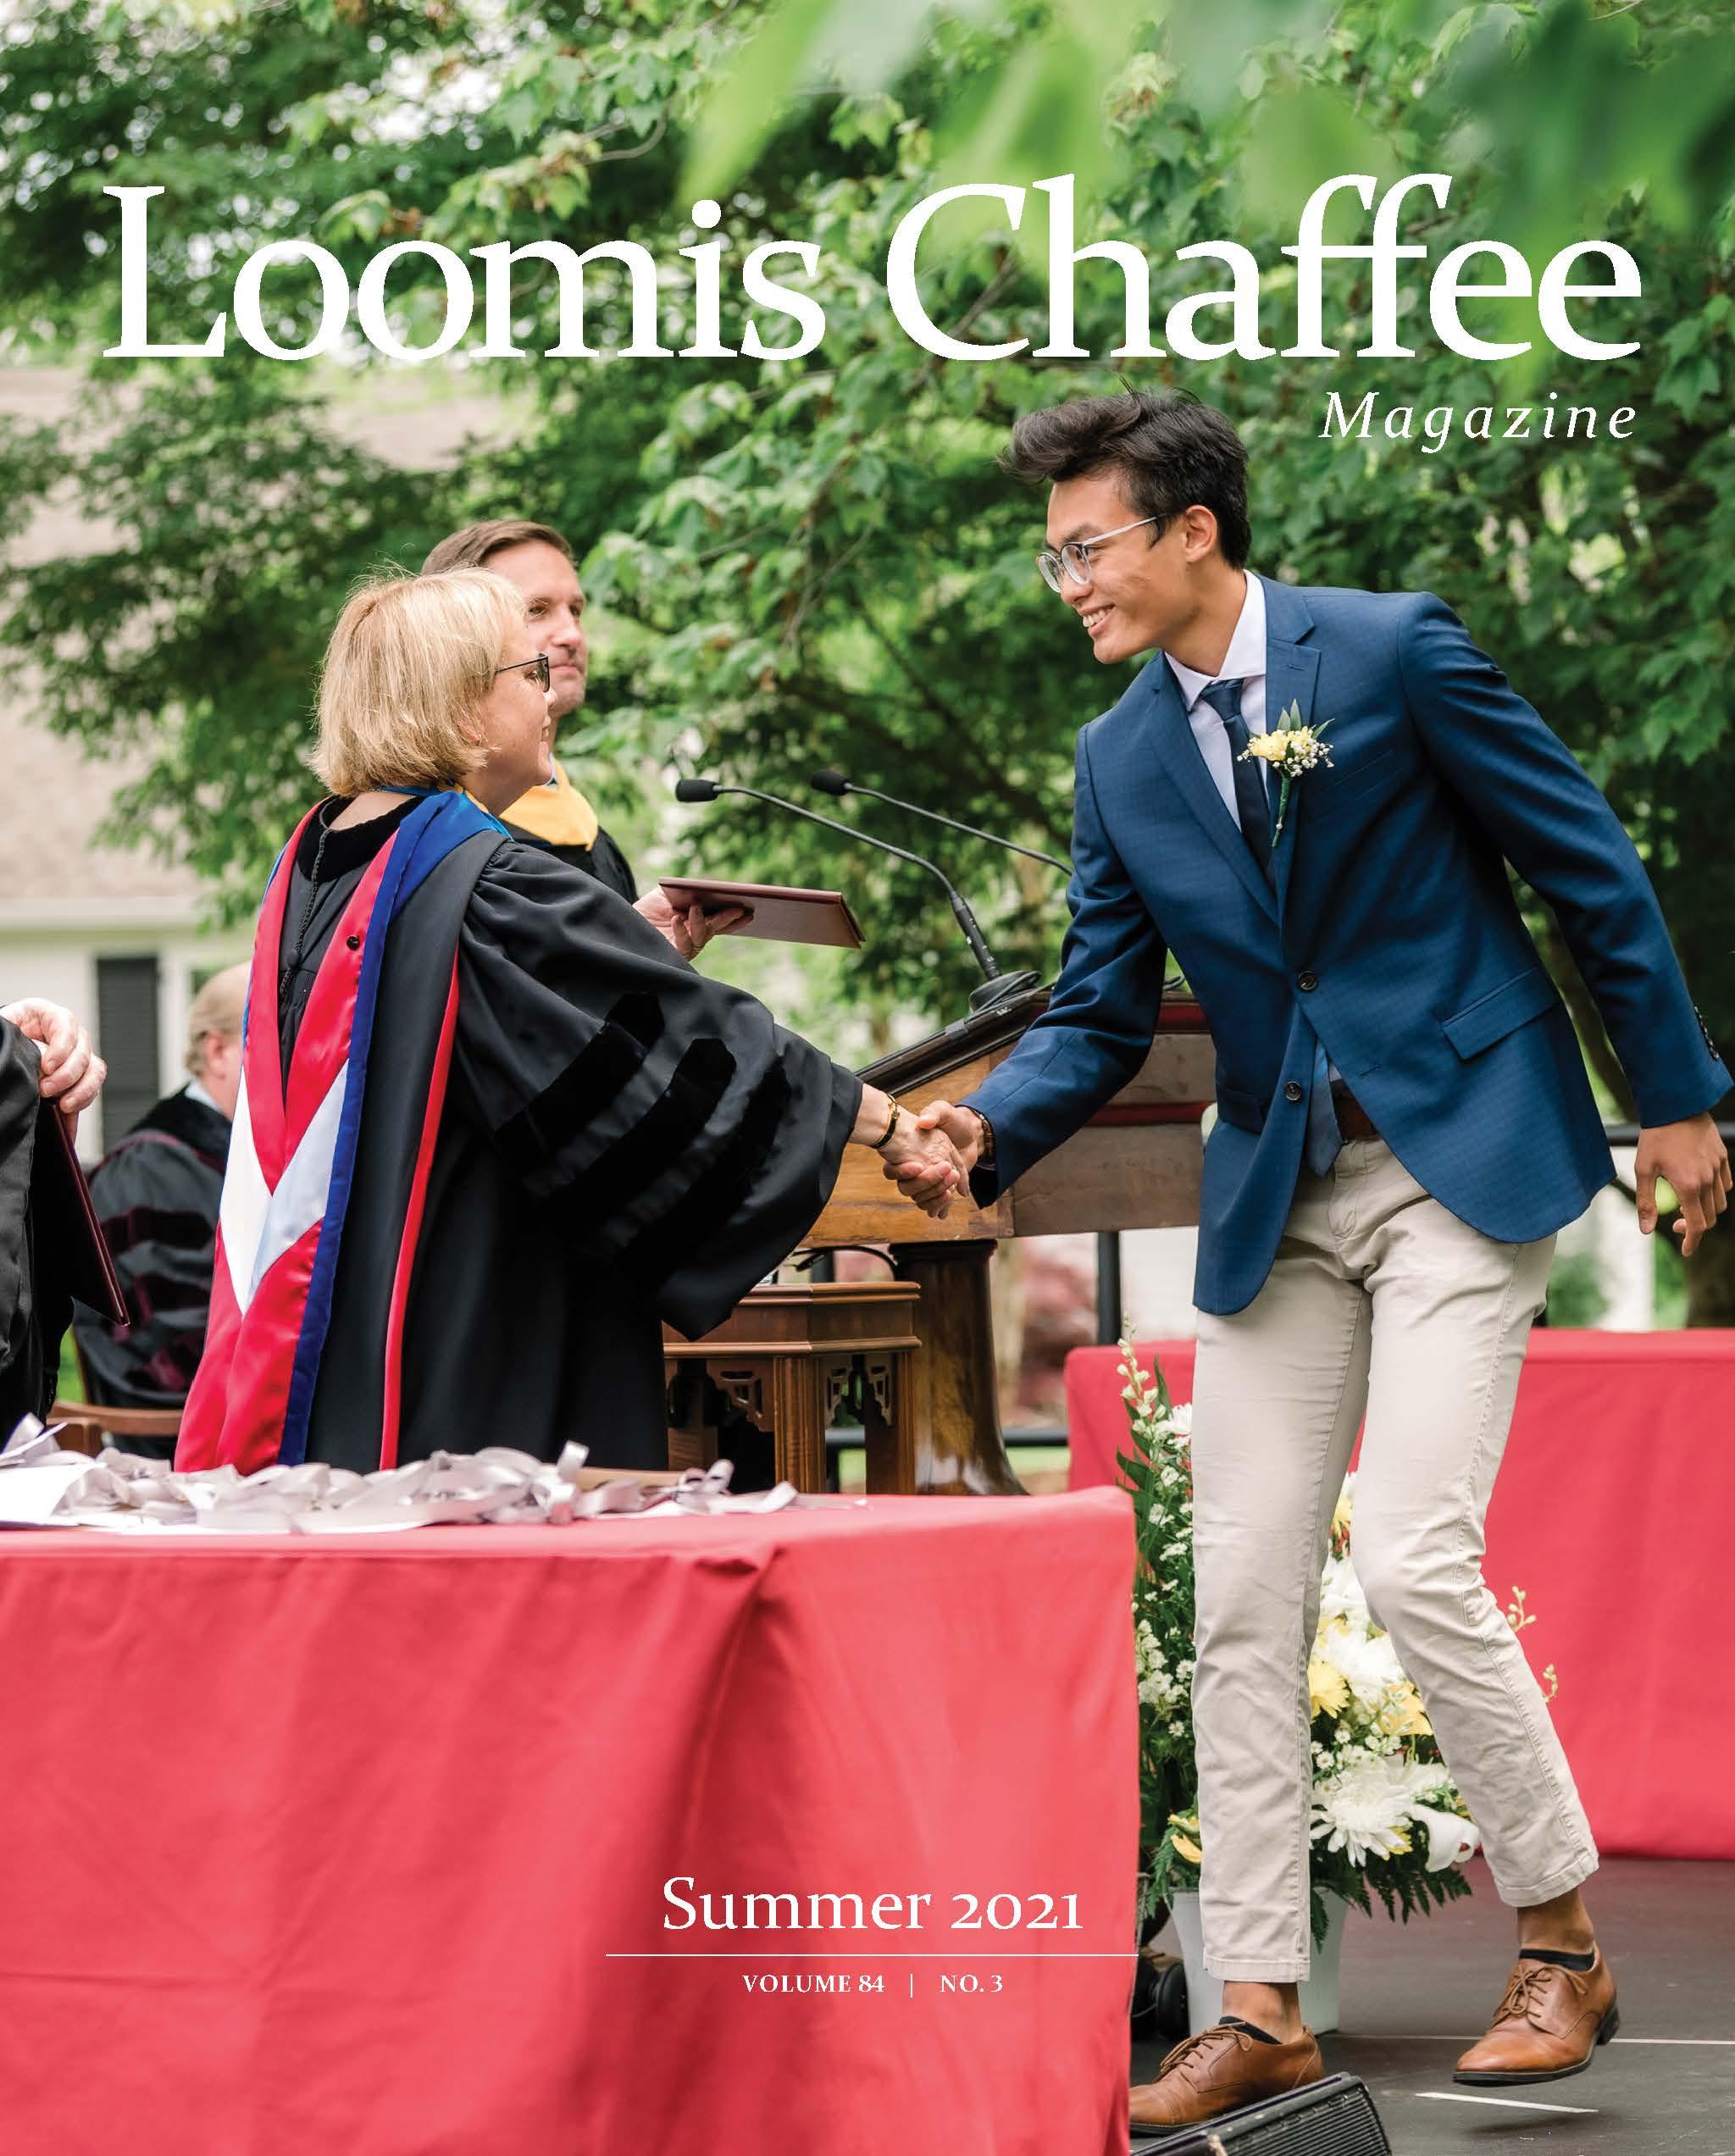 Loomis Chaffee Magazine Summer 2021